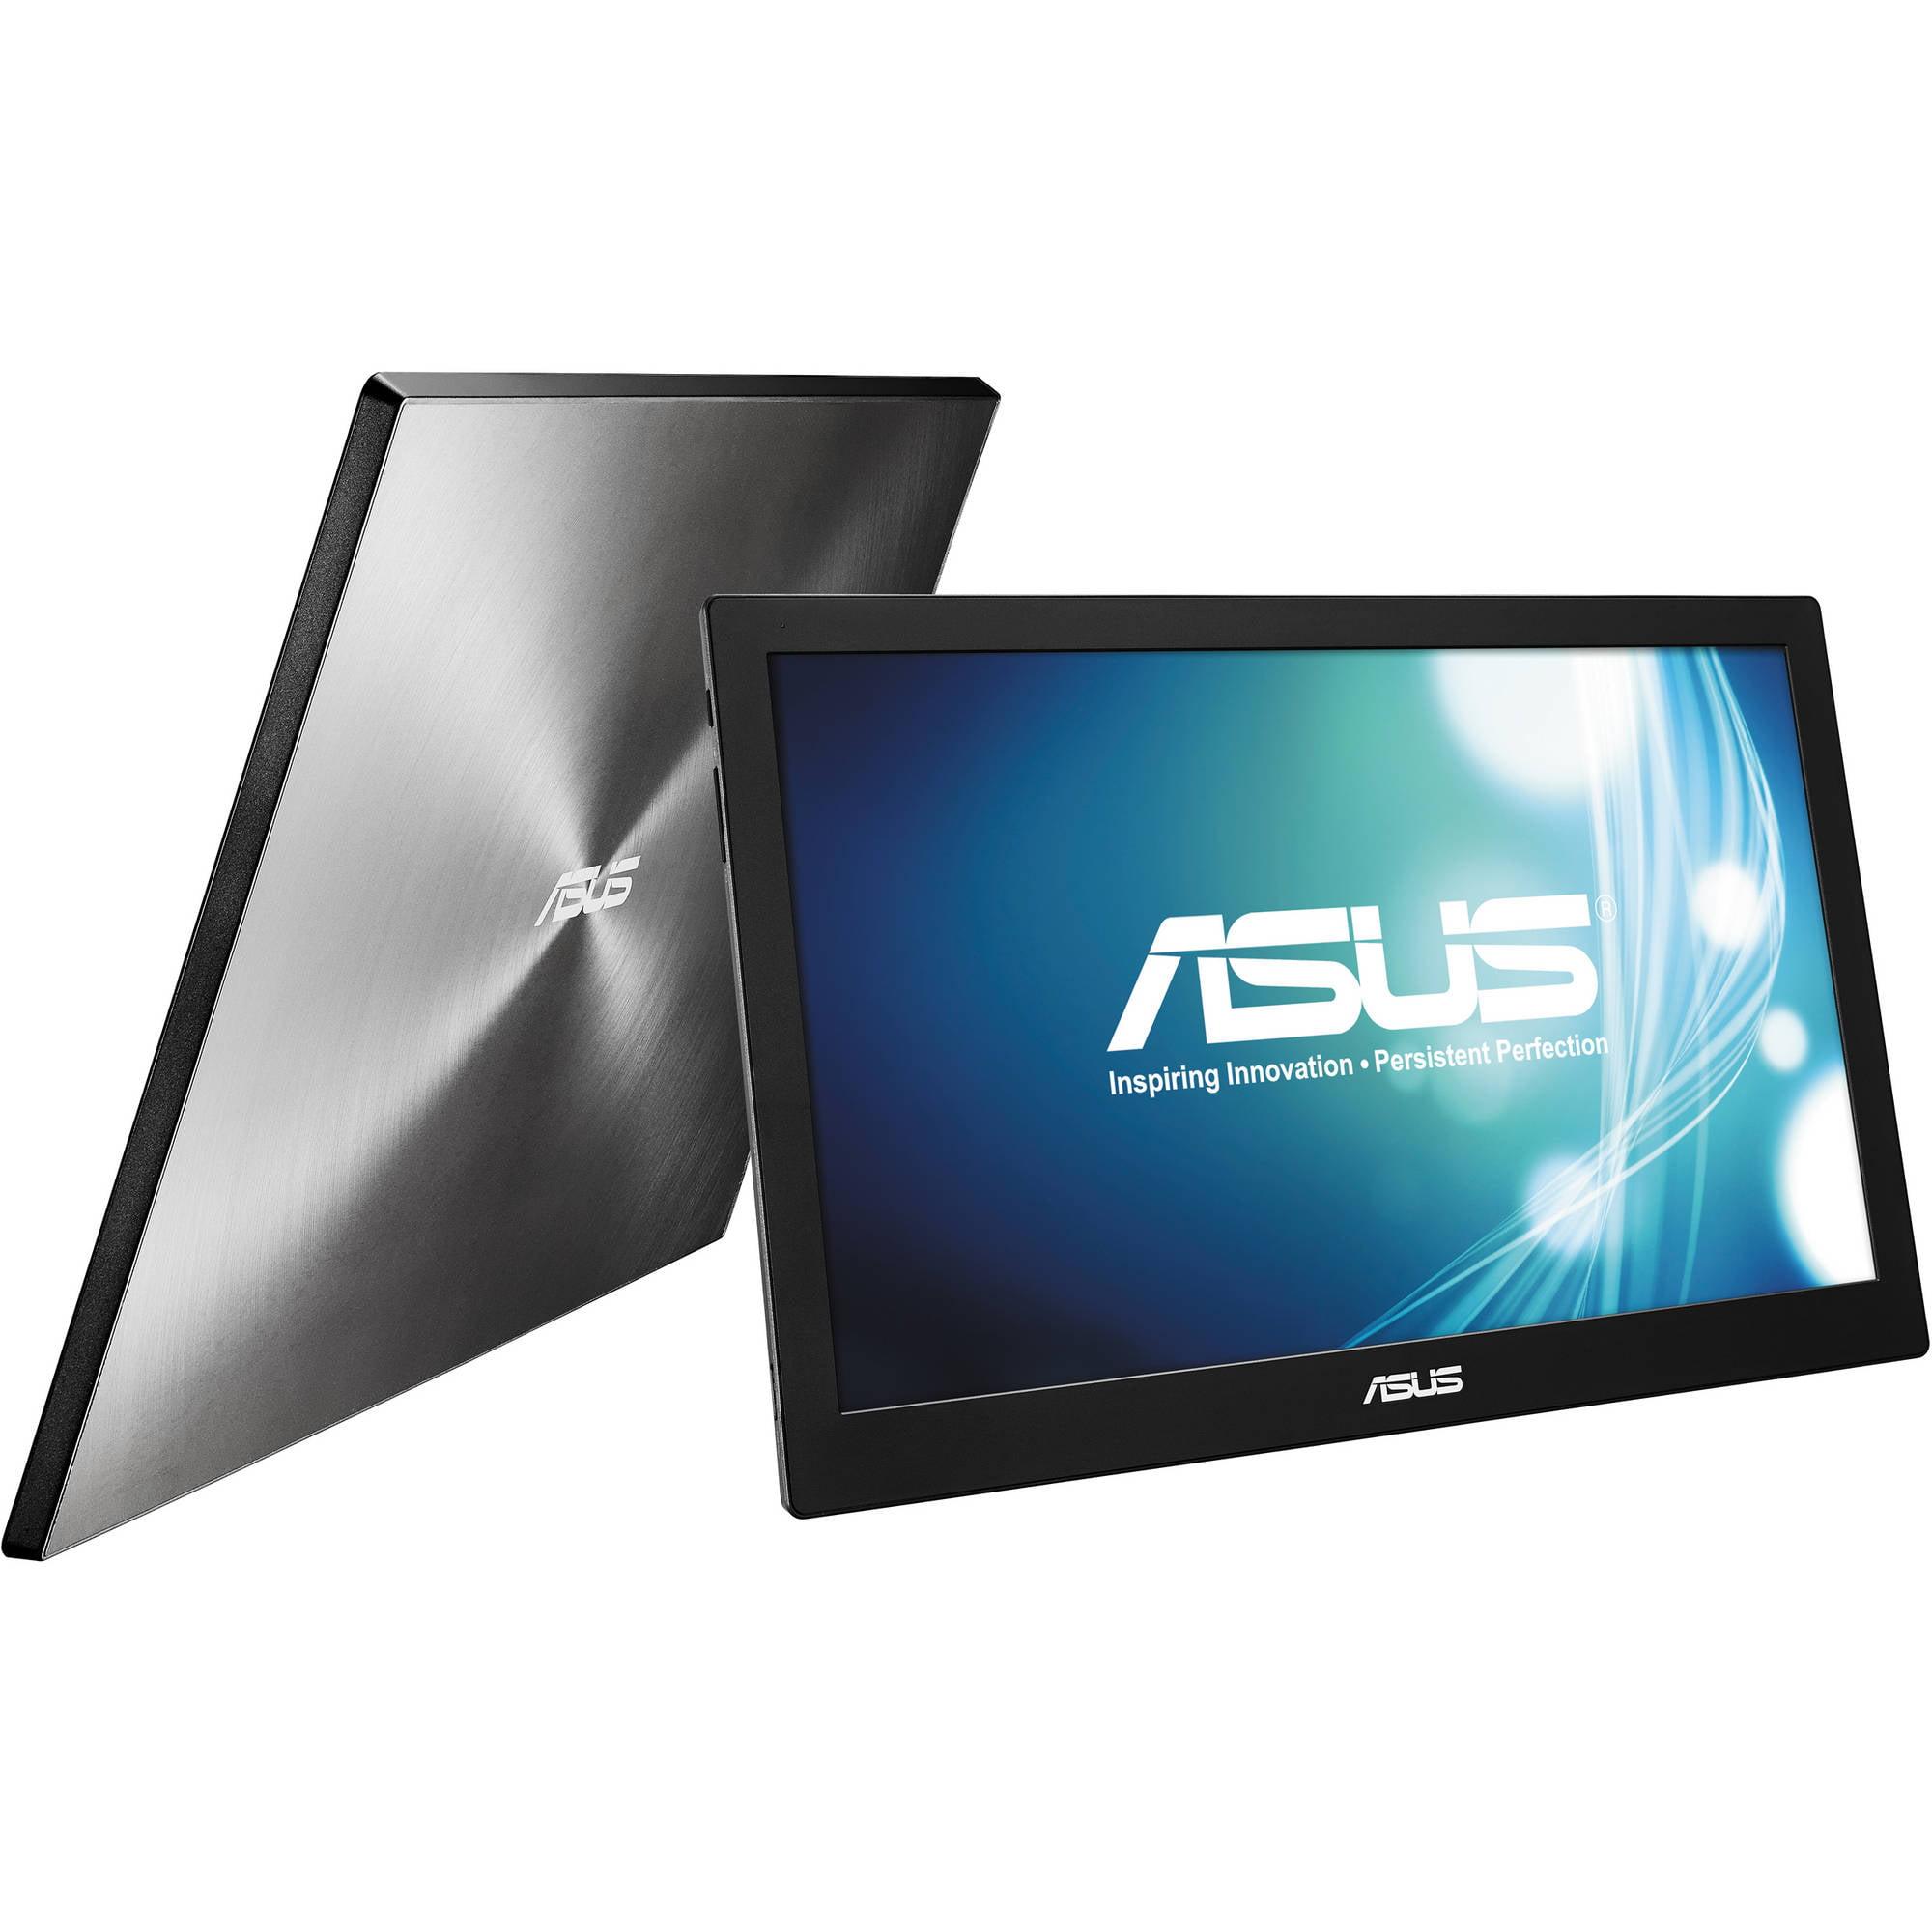 Refurbished - ASUS MB168B 15.6 11ms Widescreen LED/TN Portable Monitor 1366x768